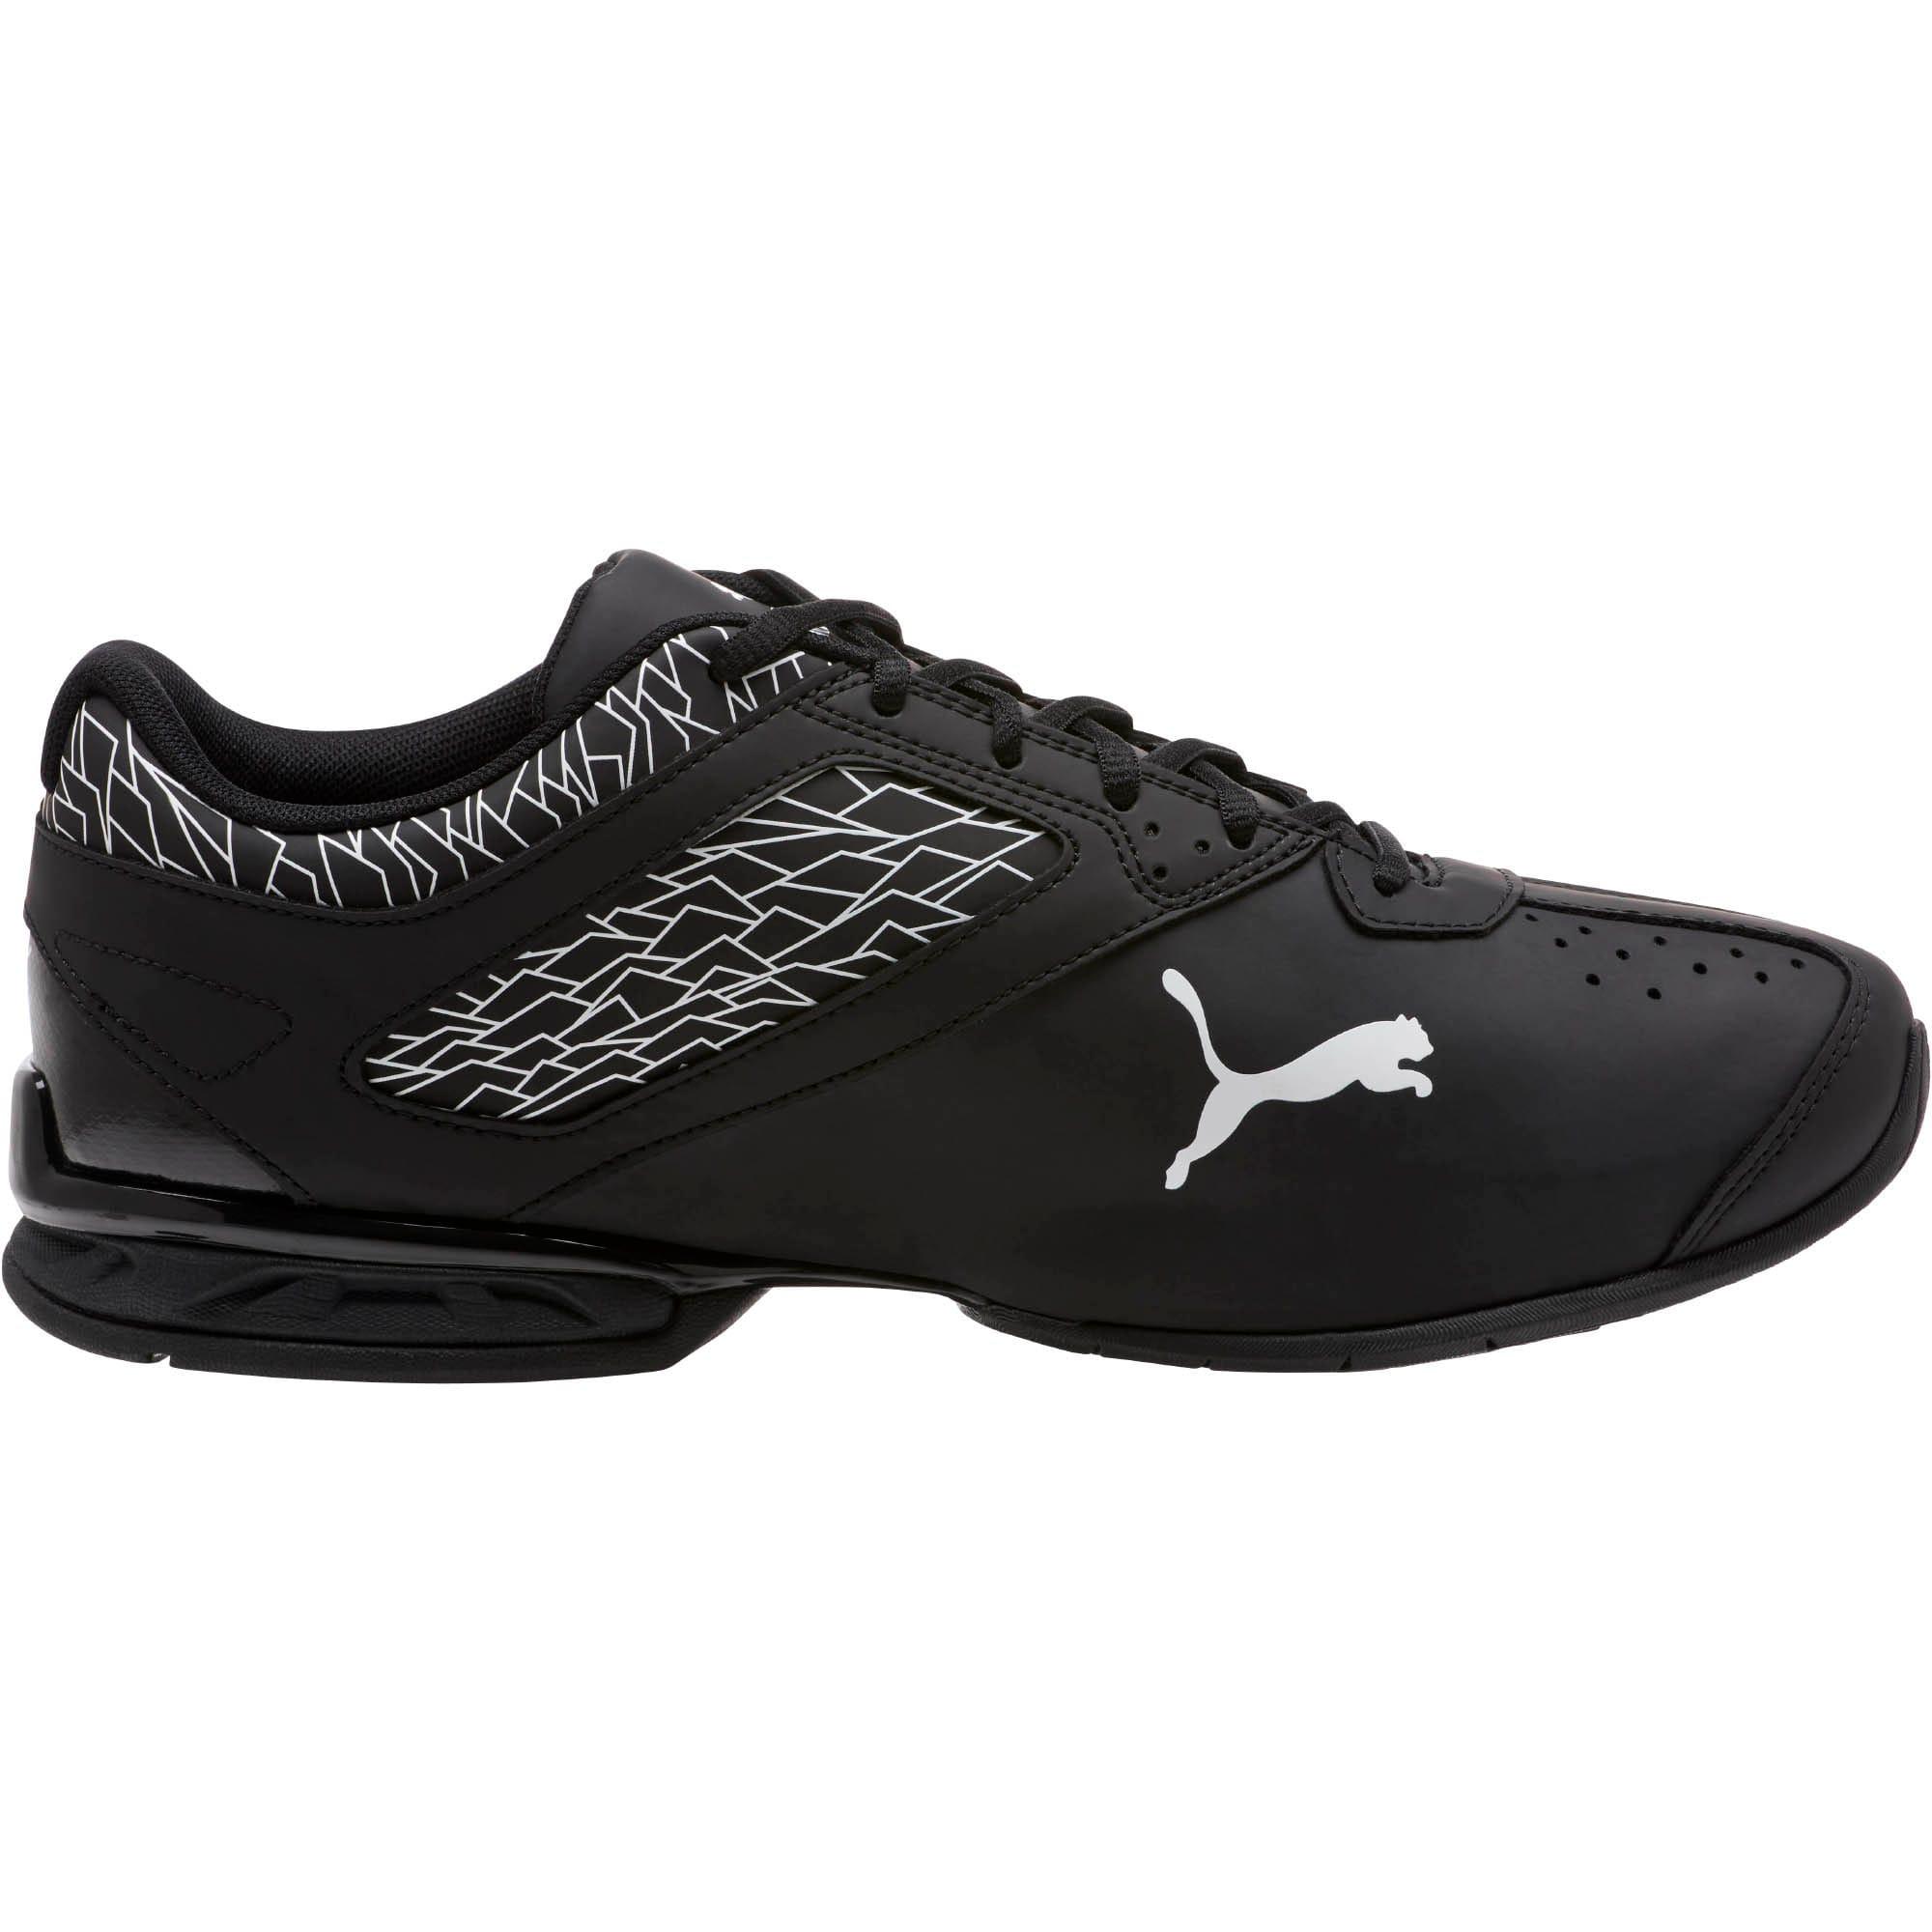 Thumbnail 3 of Tazon 6 Fracture FM Wide Men's Sneakers, Puma Black-Puma Black, medium